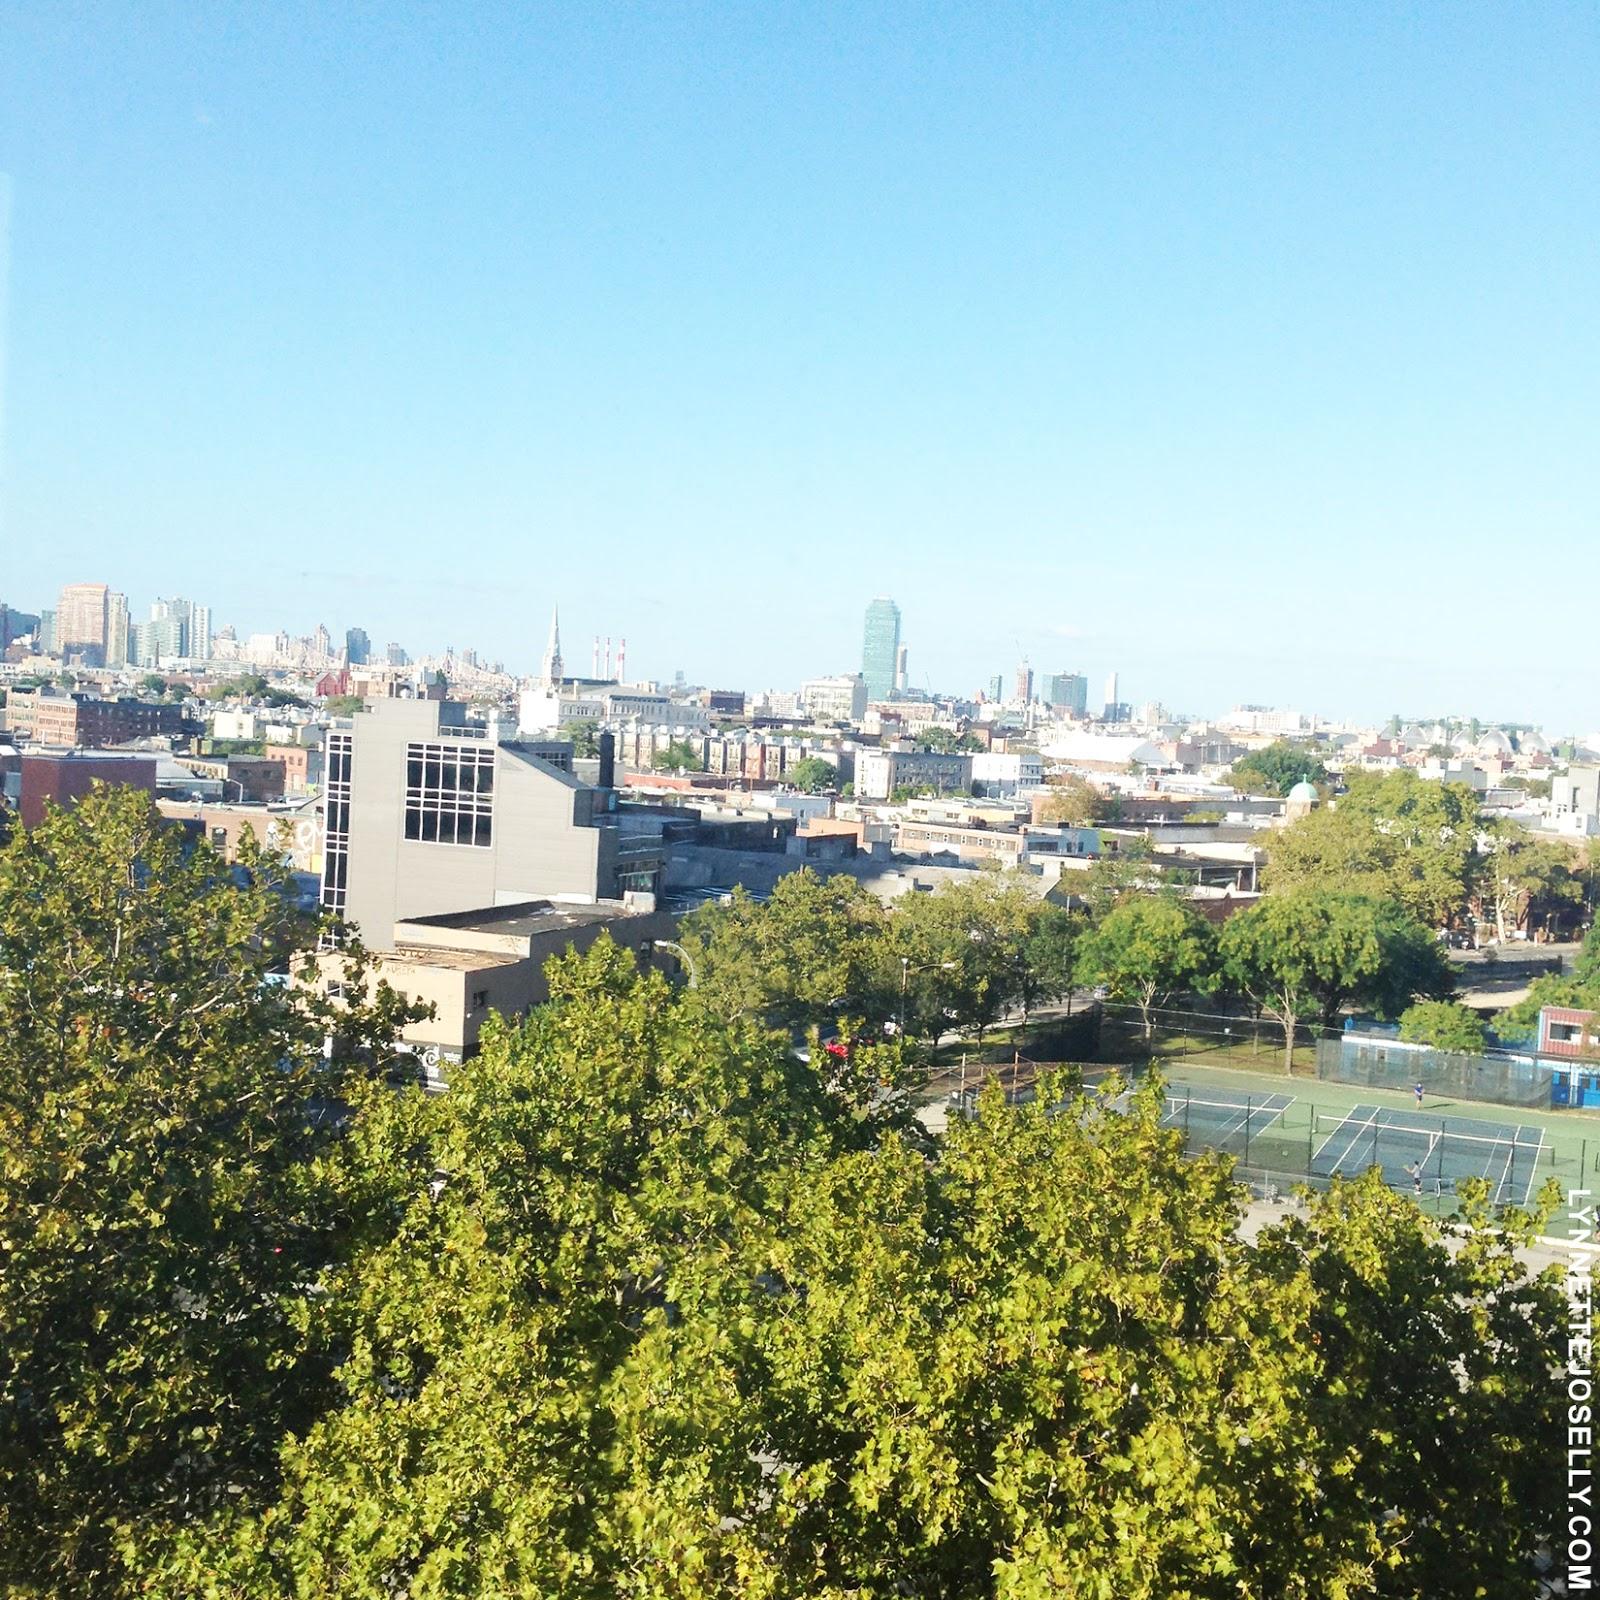 xanadu-mccarren-hotel-rooftop-brooklyn-newyork